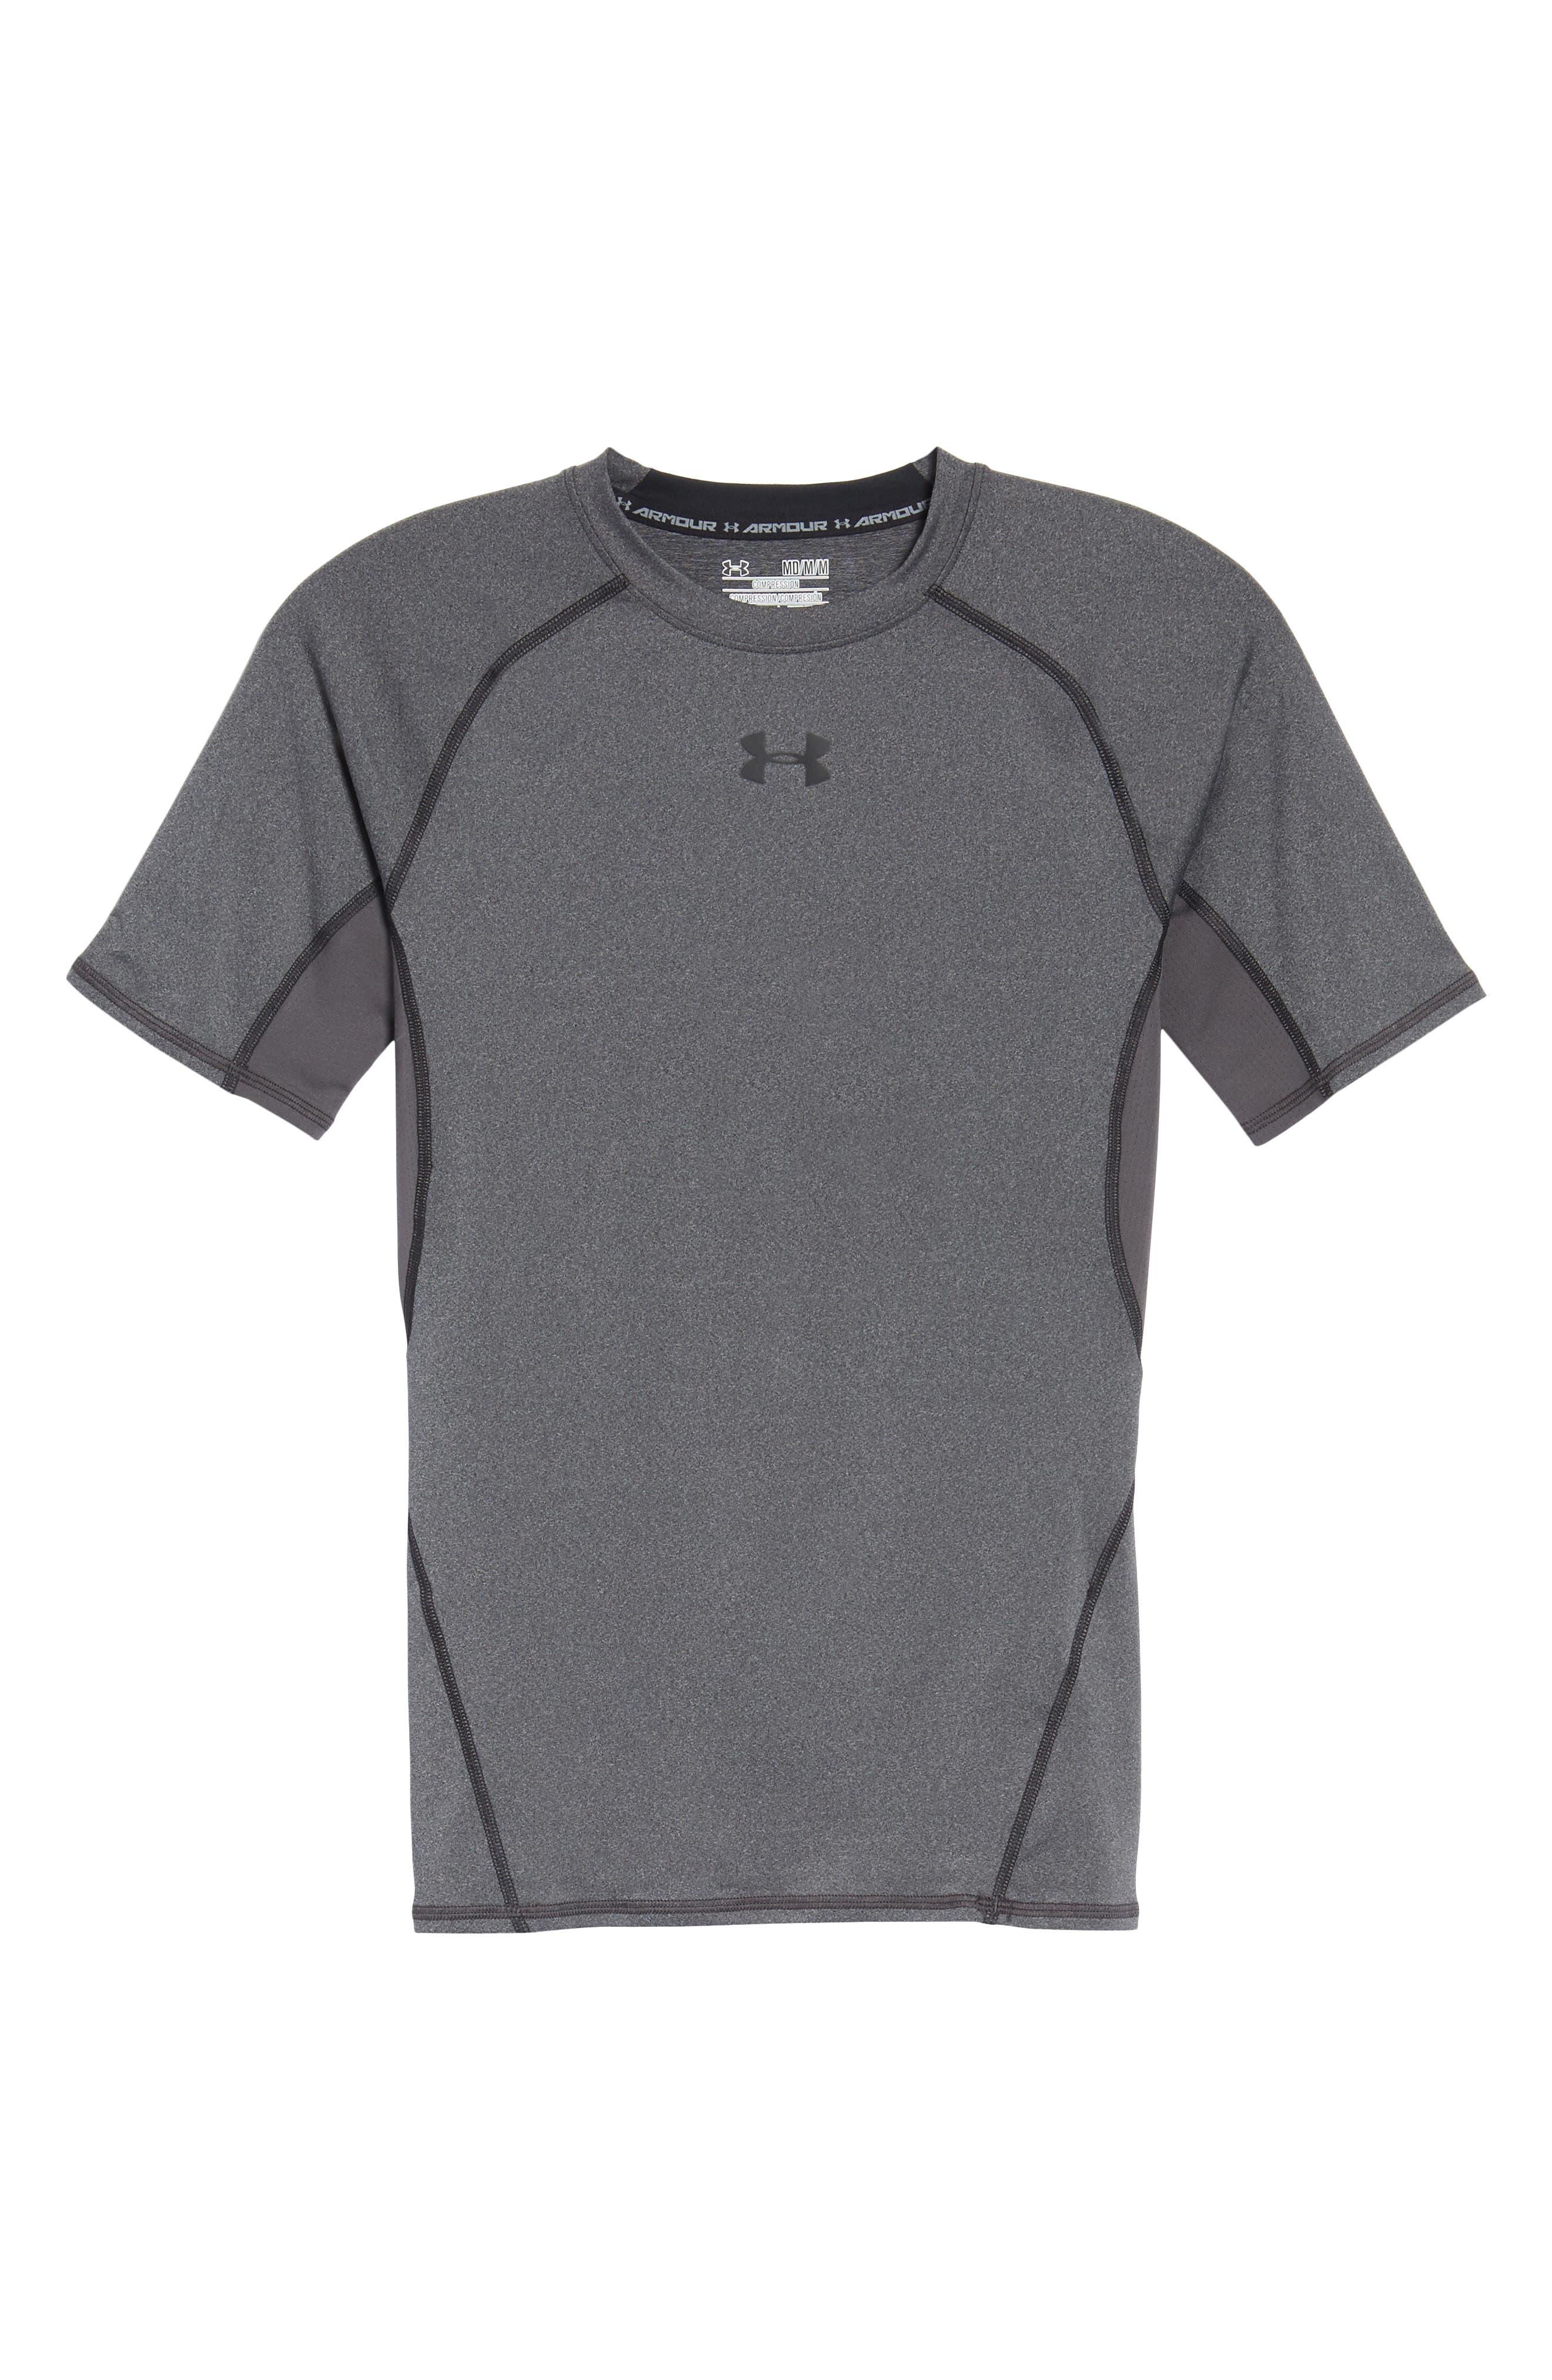 HeatGear<sup>®</sup> Compression Fit T-Shirt,                             Alternate thumbnail 7, color,                             CARBON HEATHER/ BLACK